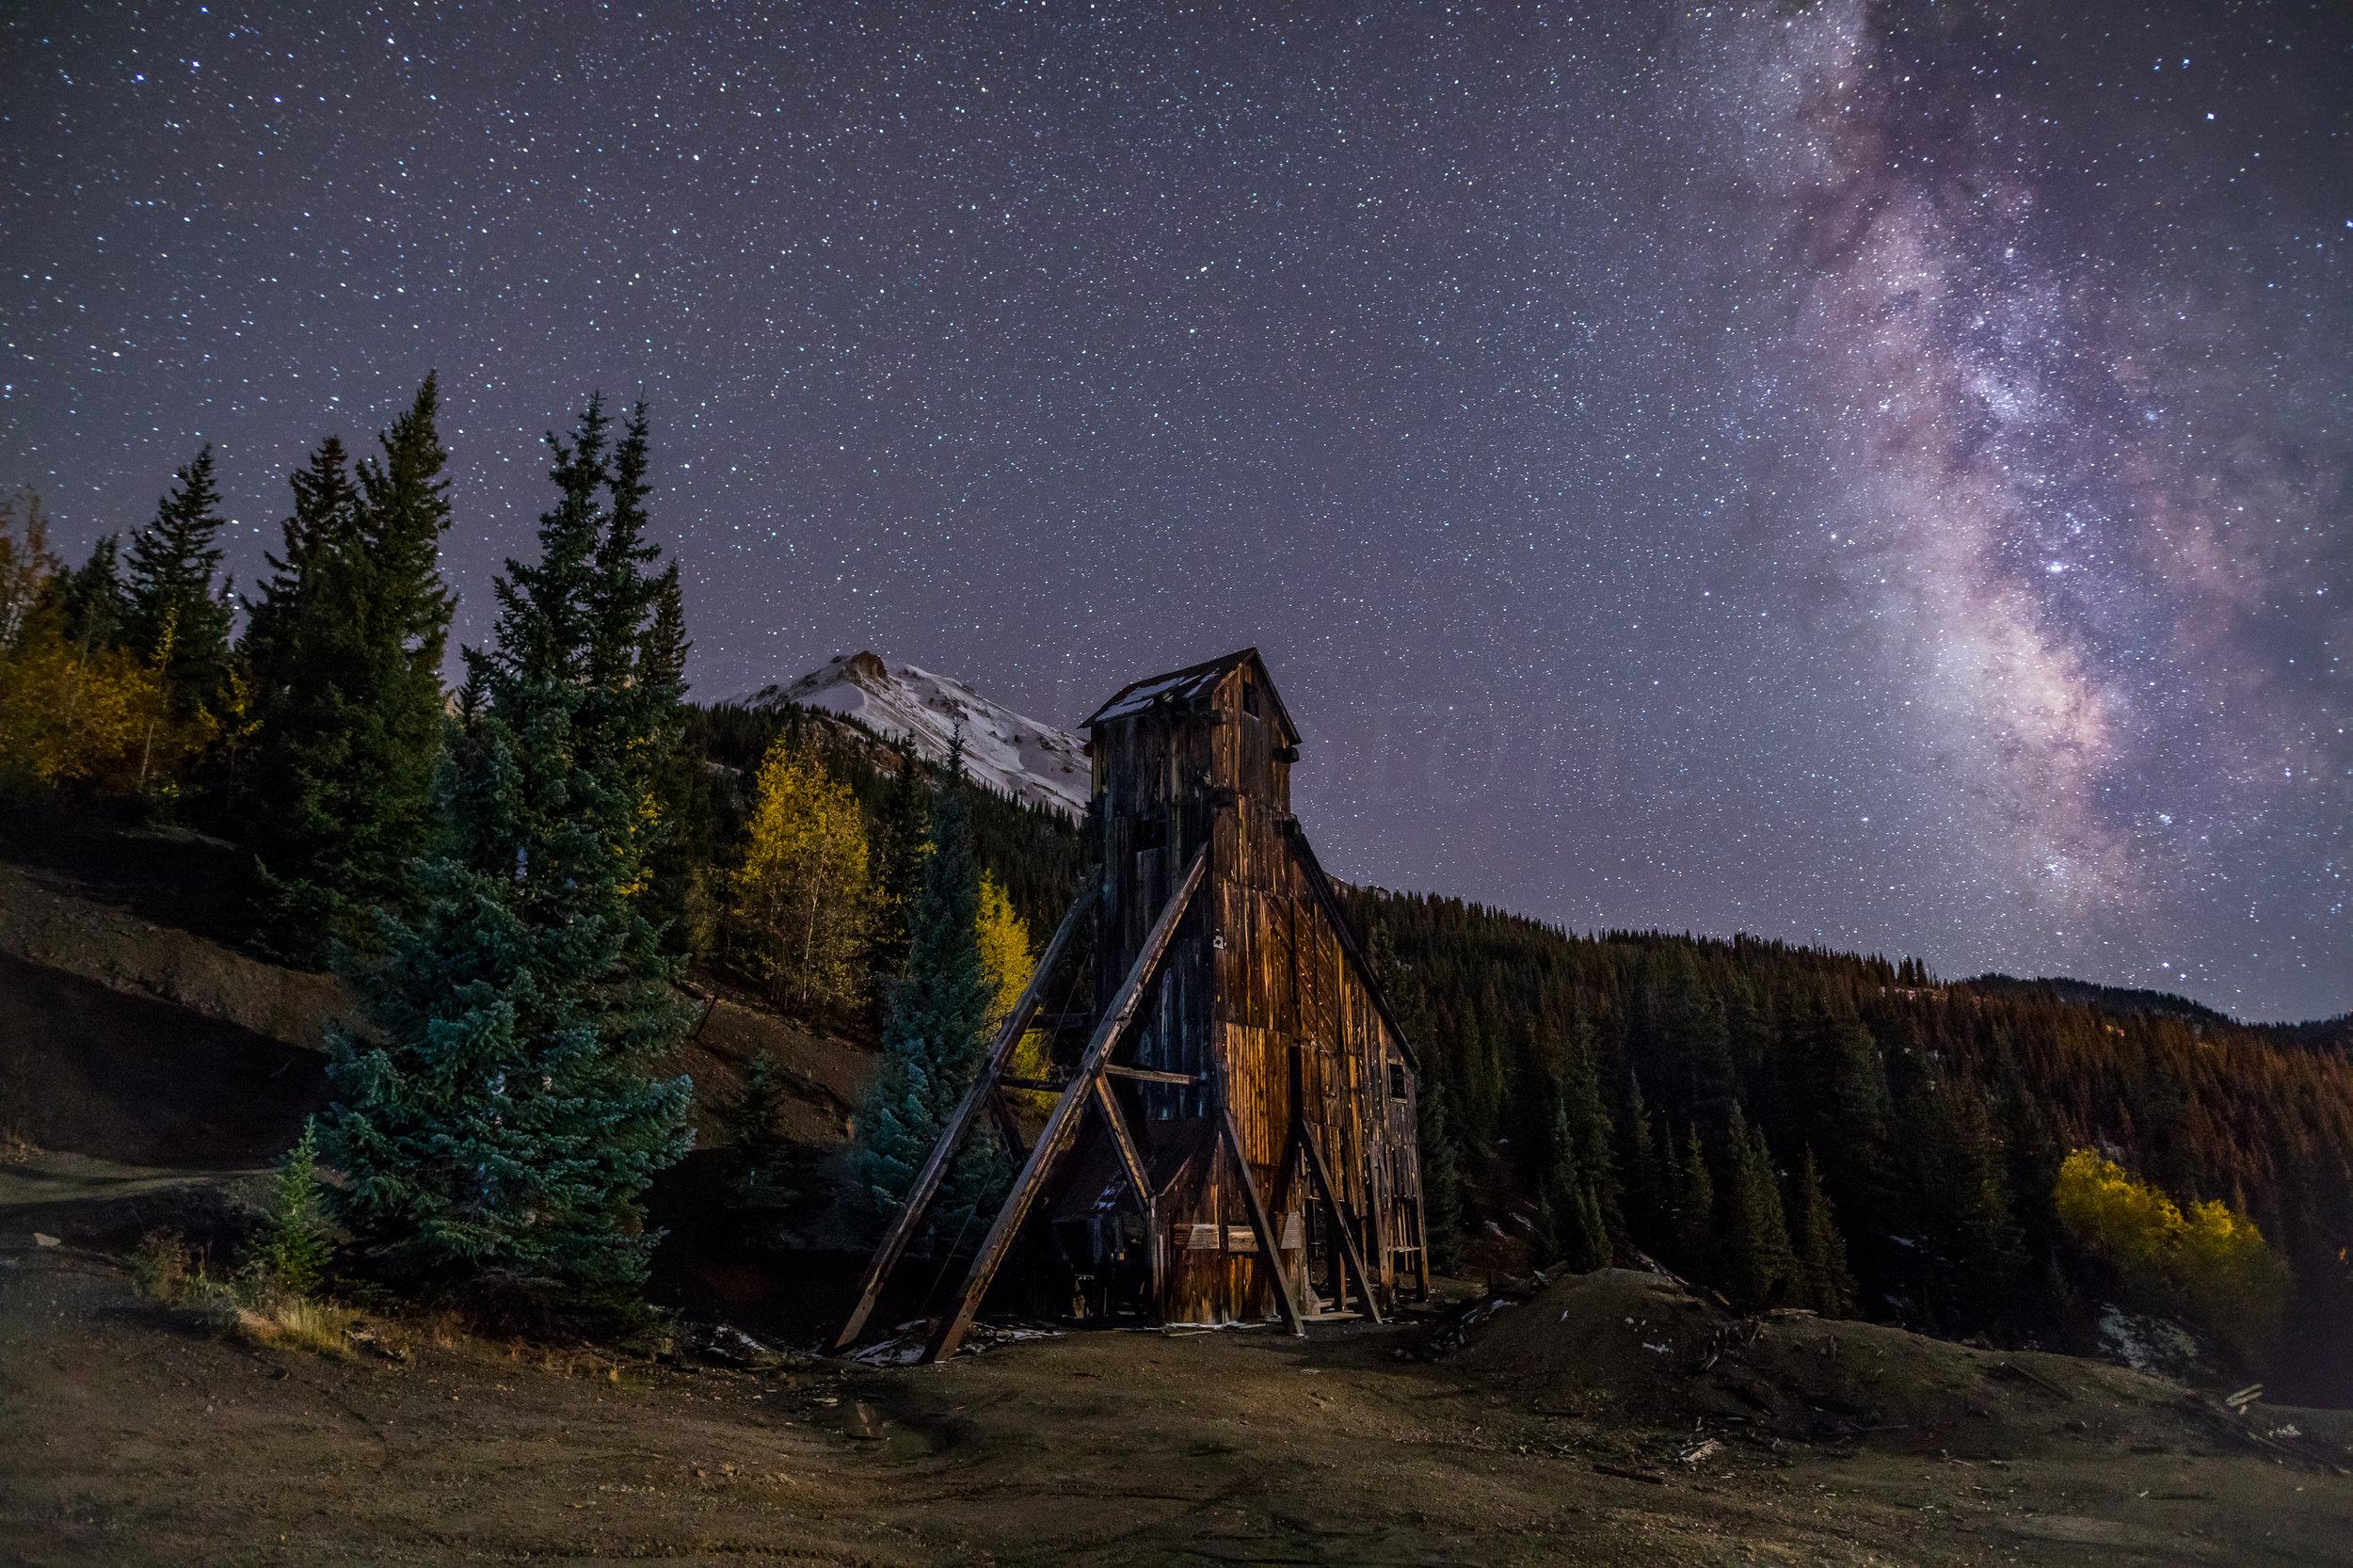 Milky way over Yankee Girl Mine, Image # 5471